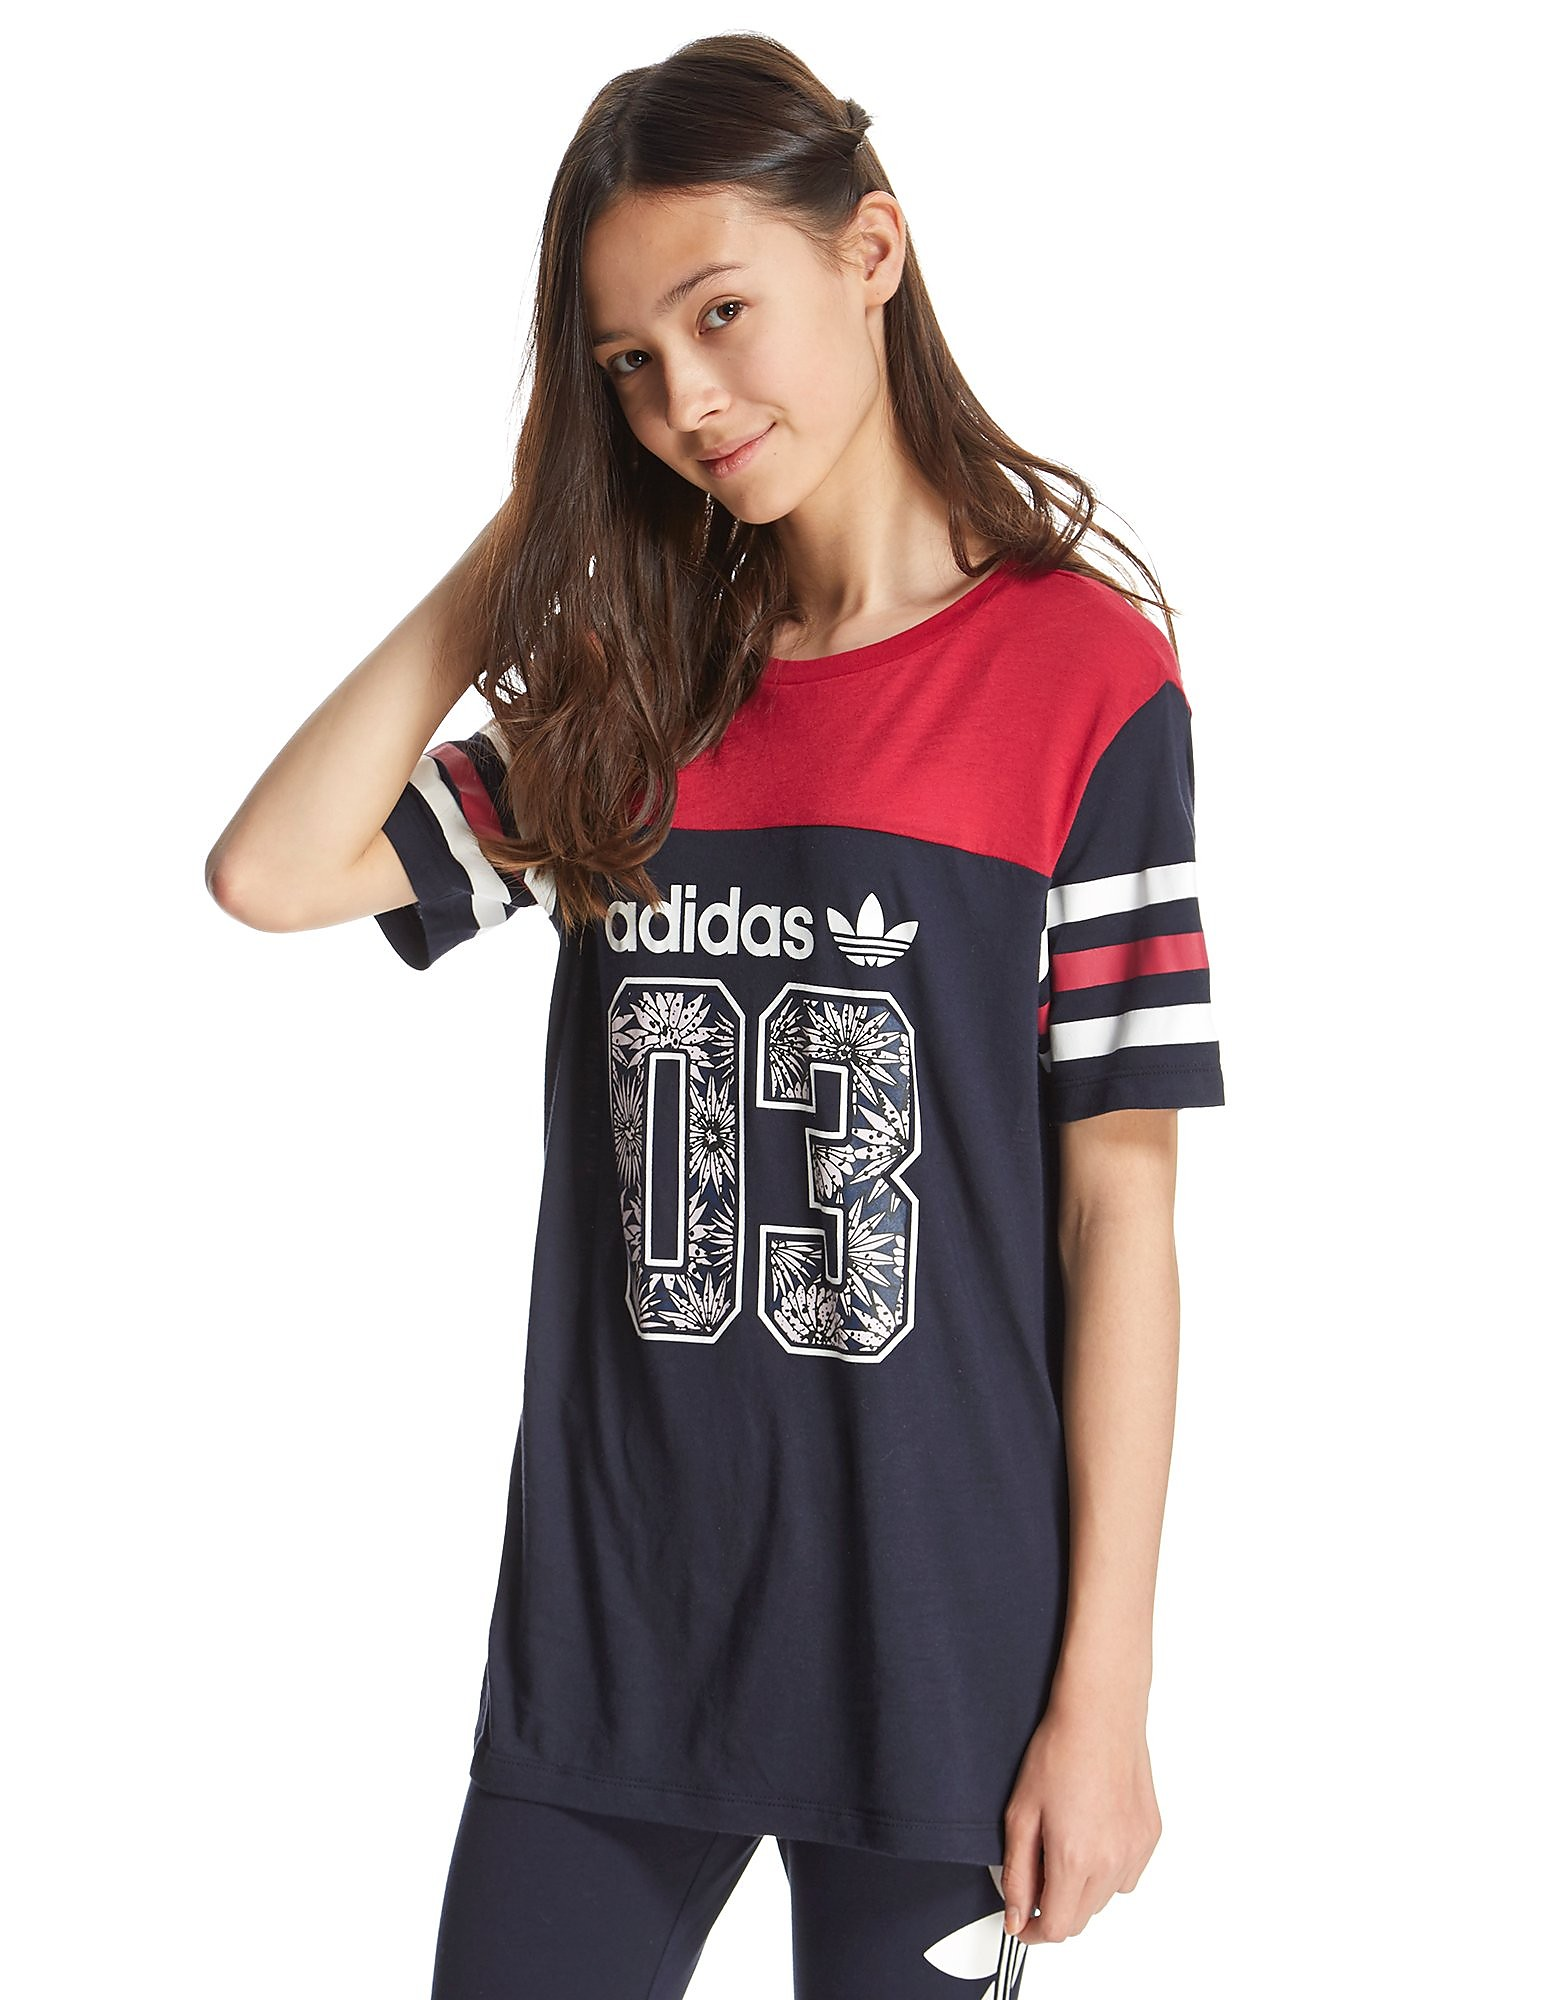 adidas Originals Girls' Colour Block T-Shirt Junior